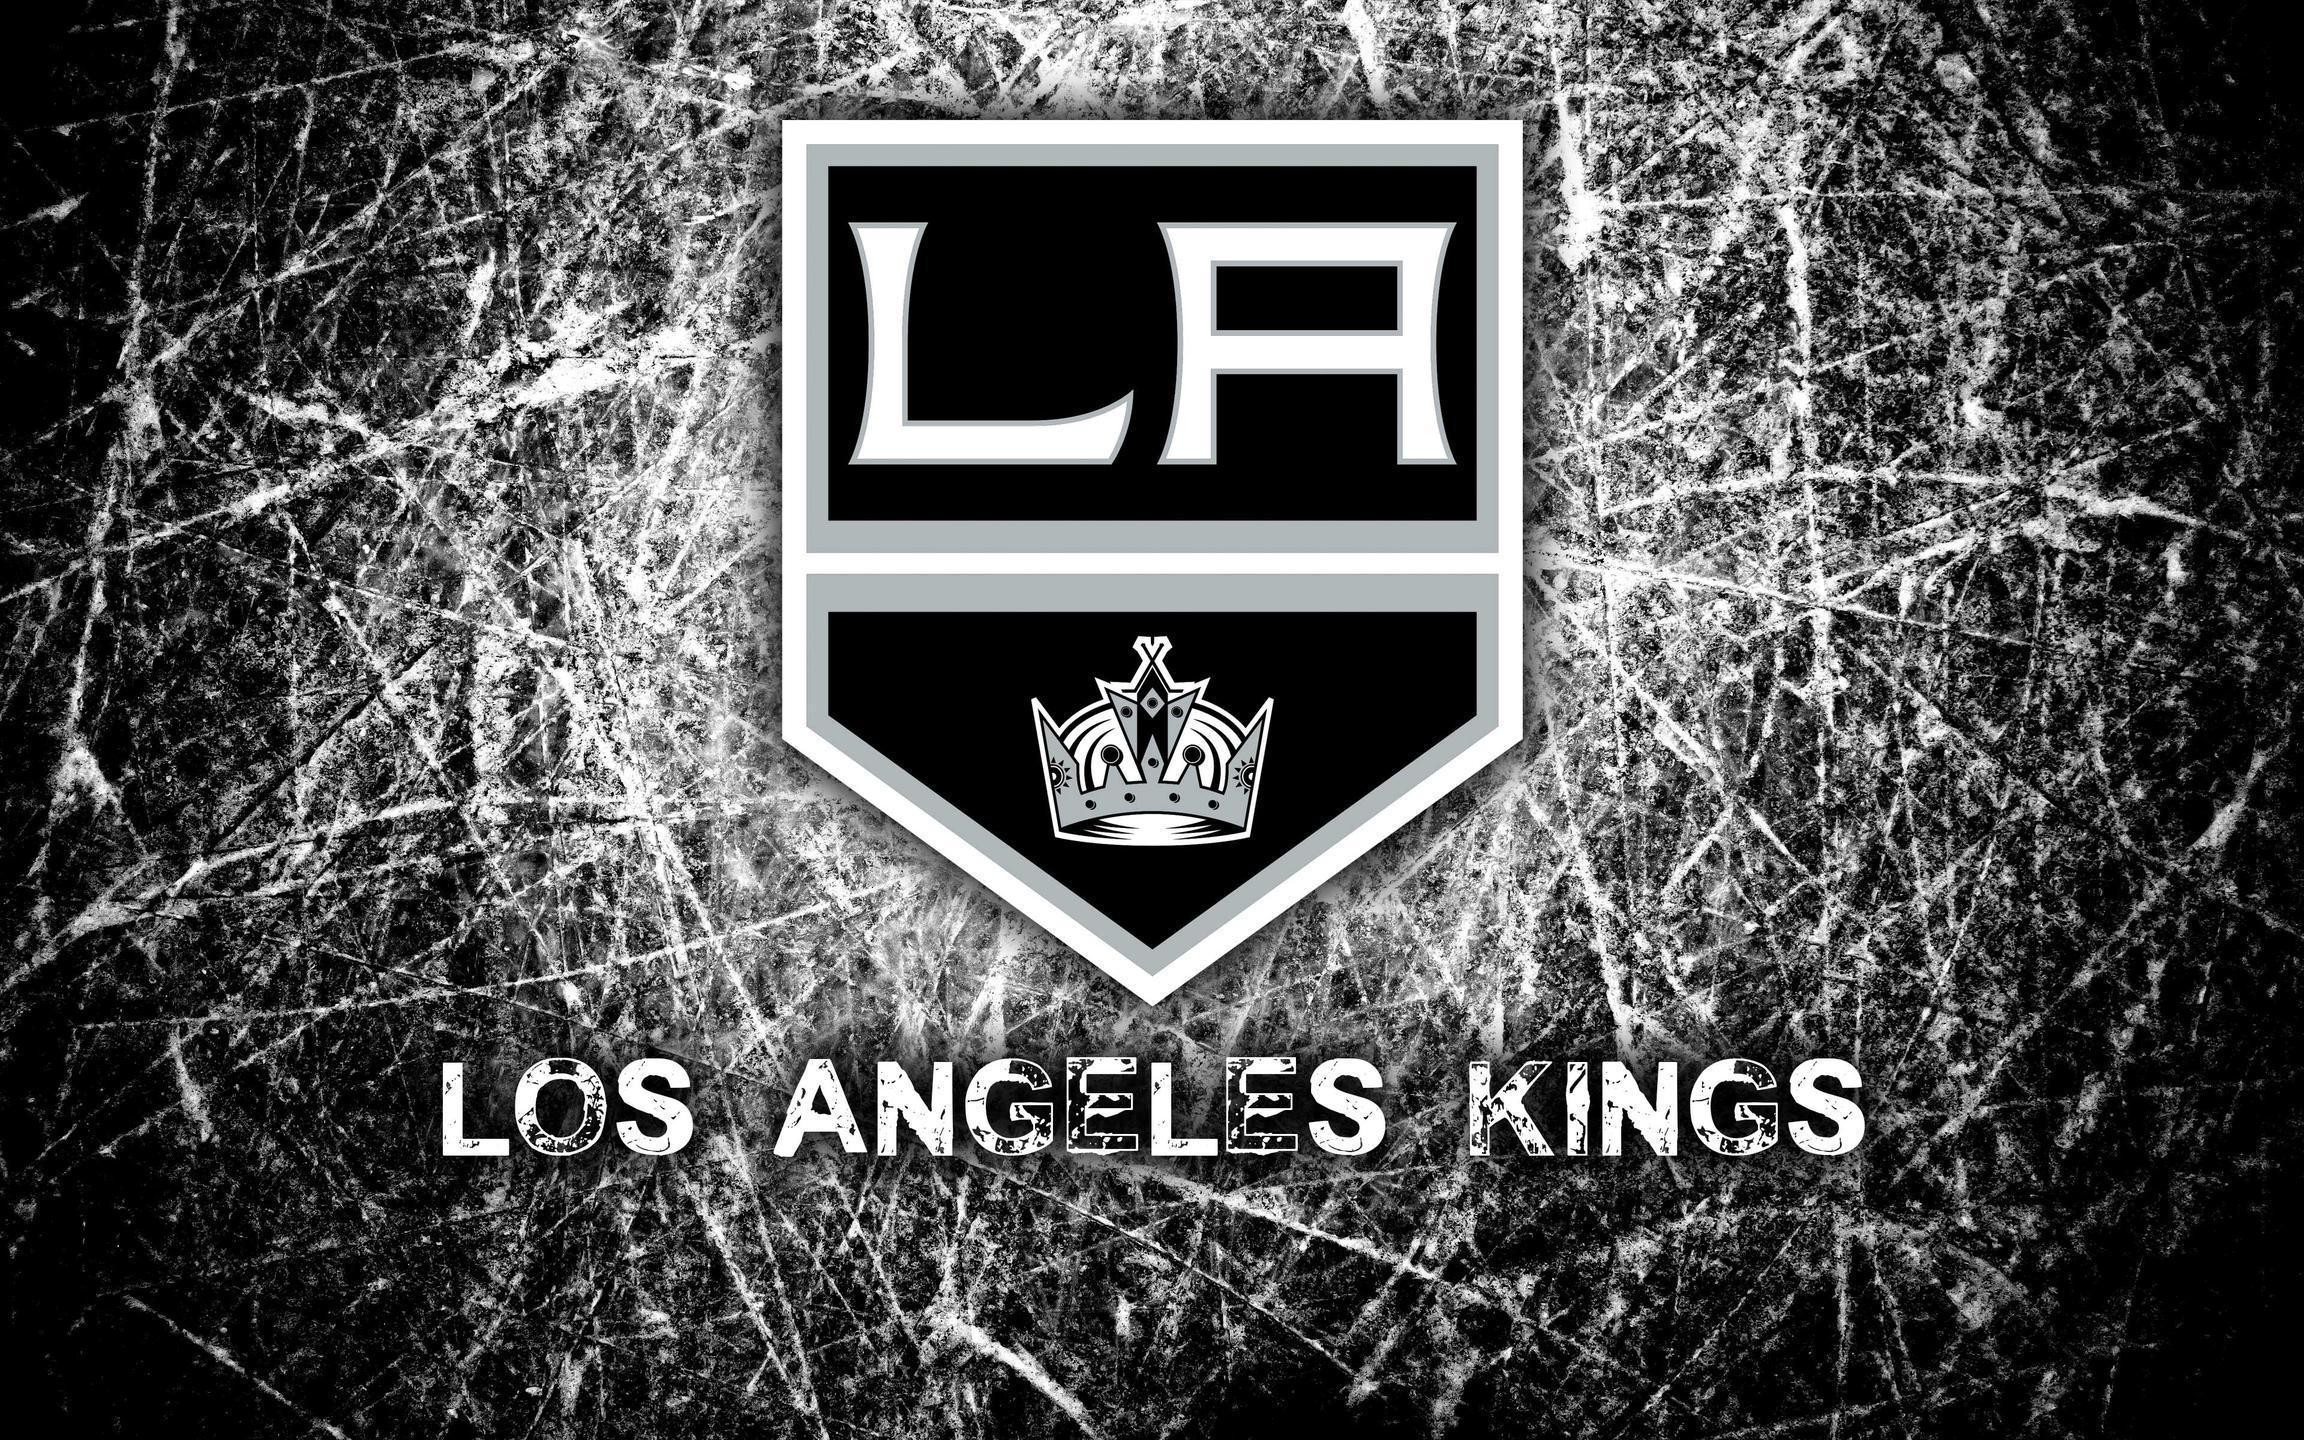 La kings logo wallpaper 72 images 2304x1440 los angeles kings 2014 logo wallpaper wide or hd sports wallpapers voltagebd Gallery